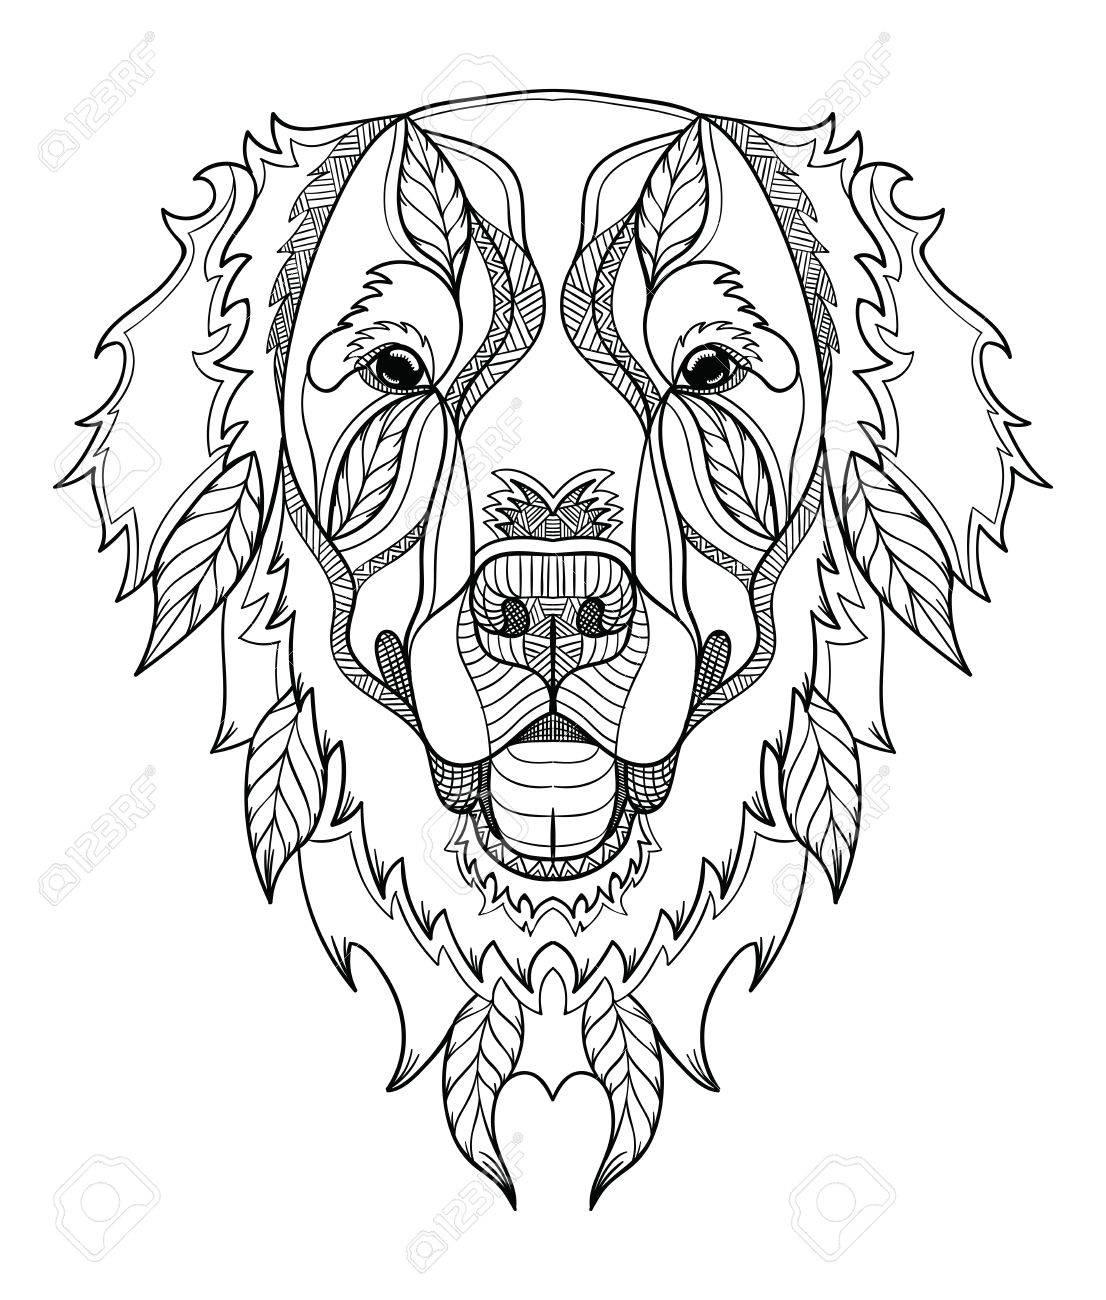 Golden Retriever Zentangle Perro Garabatos Cabeza Estilizada Dibujado A Mano Patrón Arte Zen Vector Adornado Ejemplo Blanco Y Negro Sobre Fondo